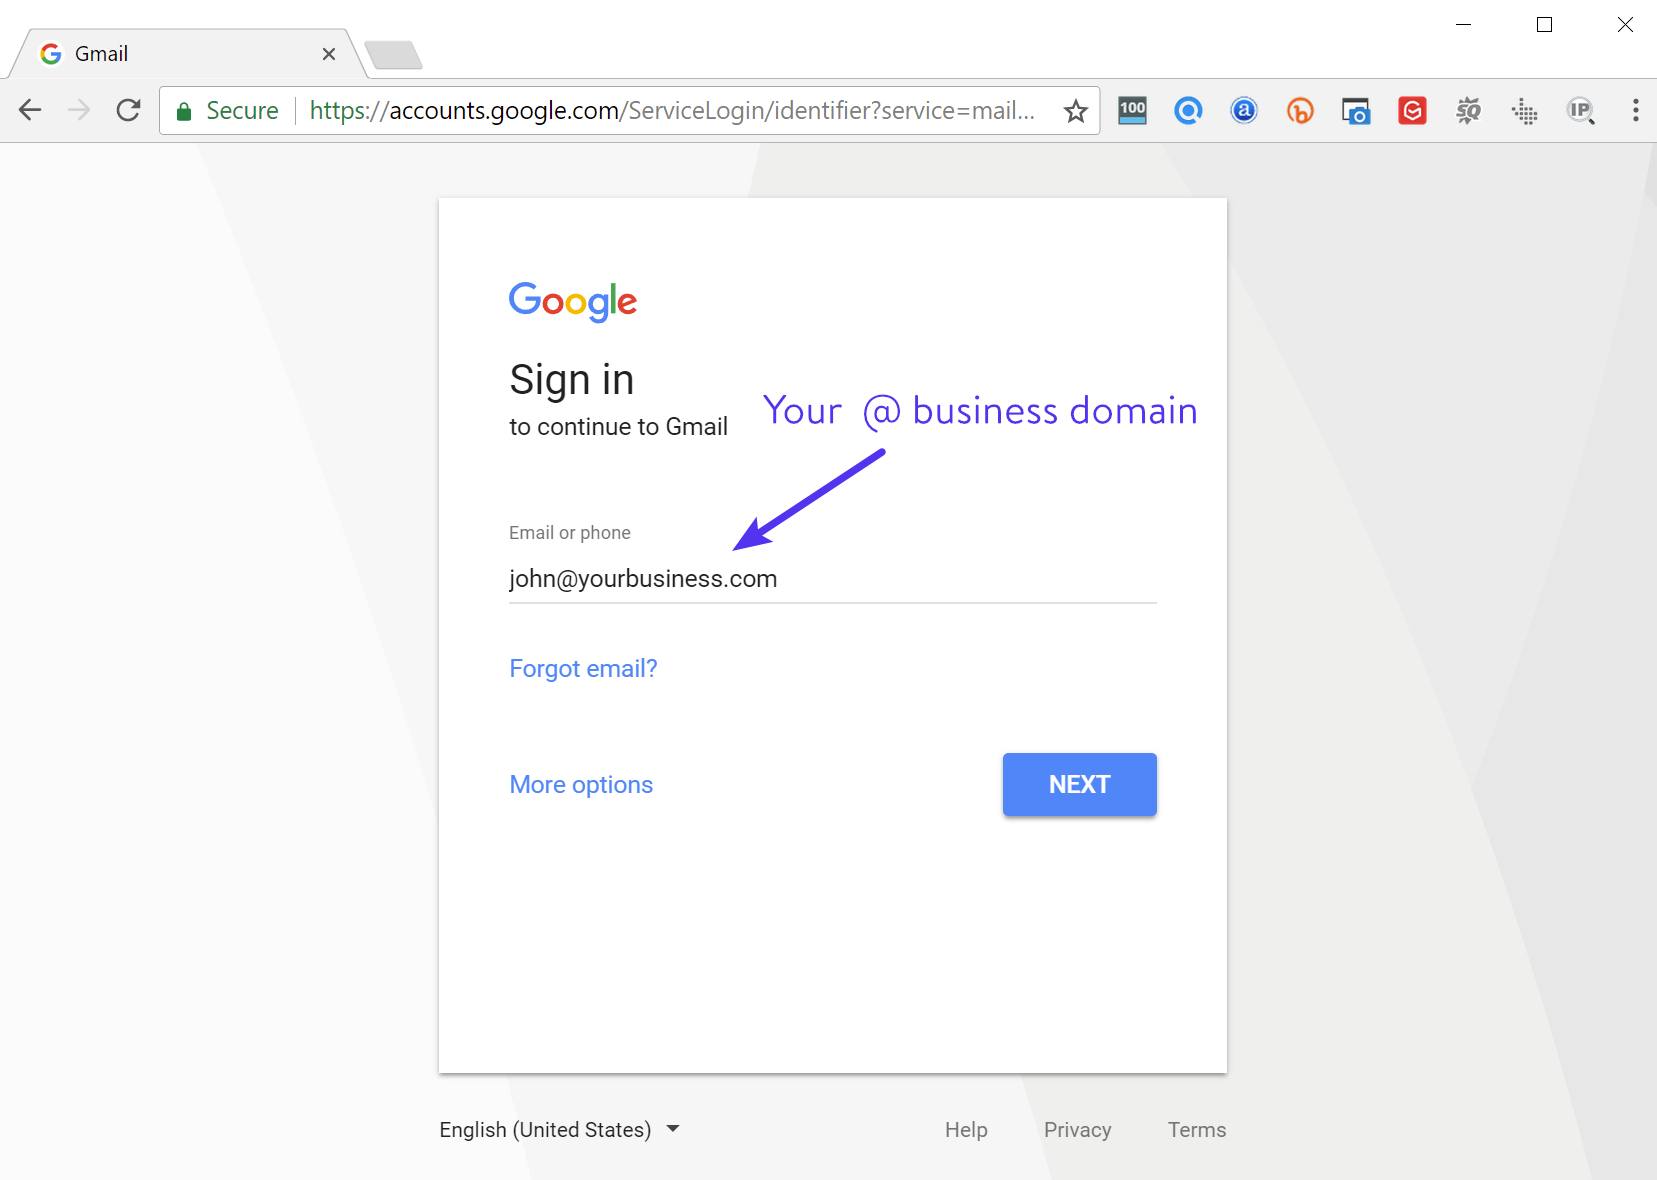 Gmail domínio personalizado